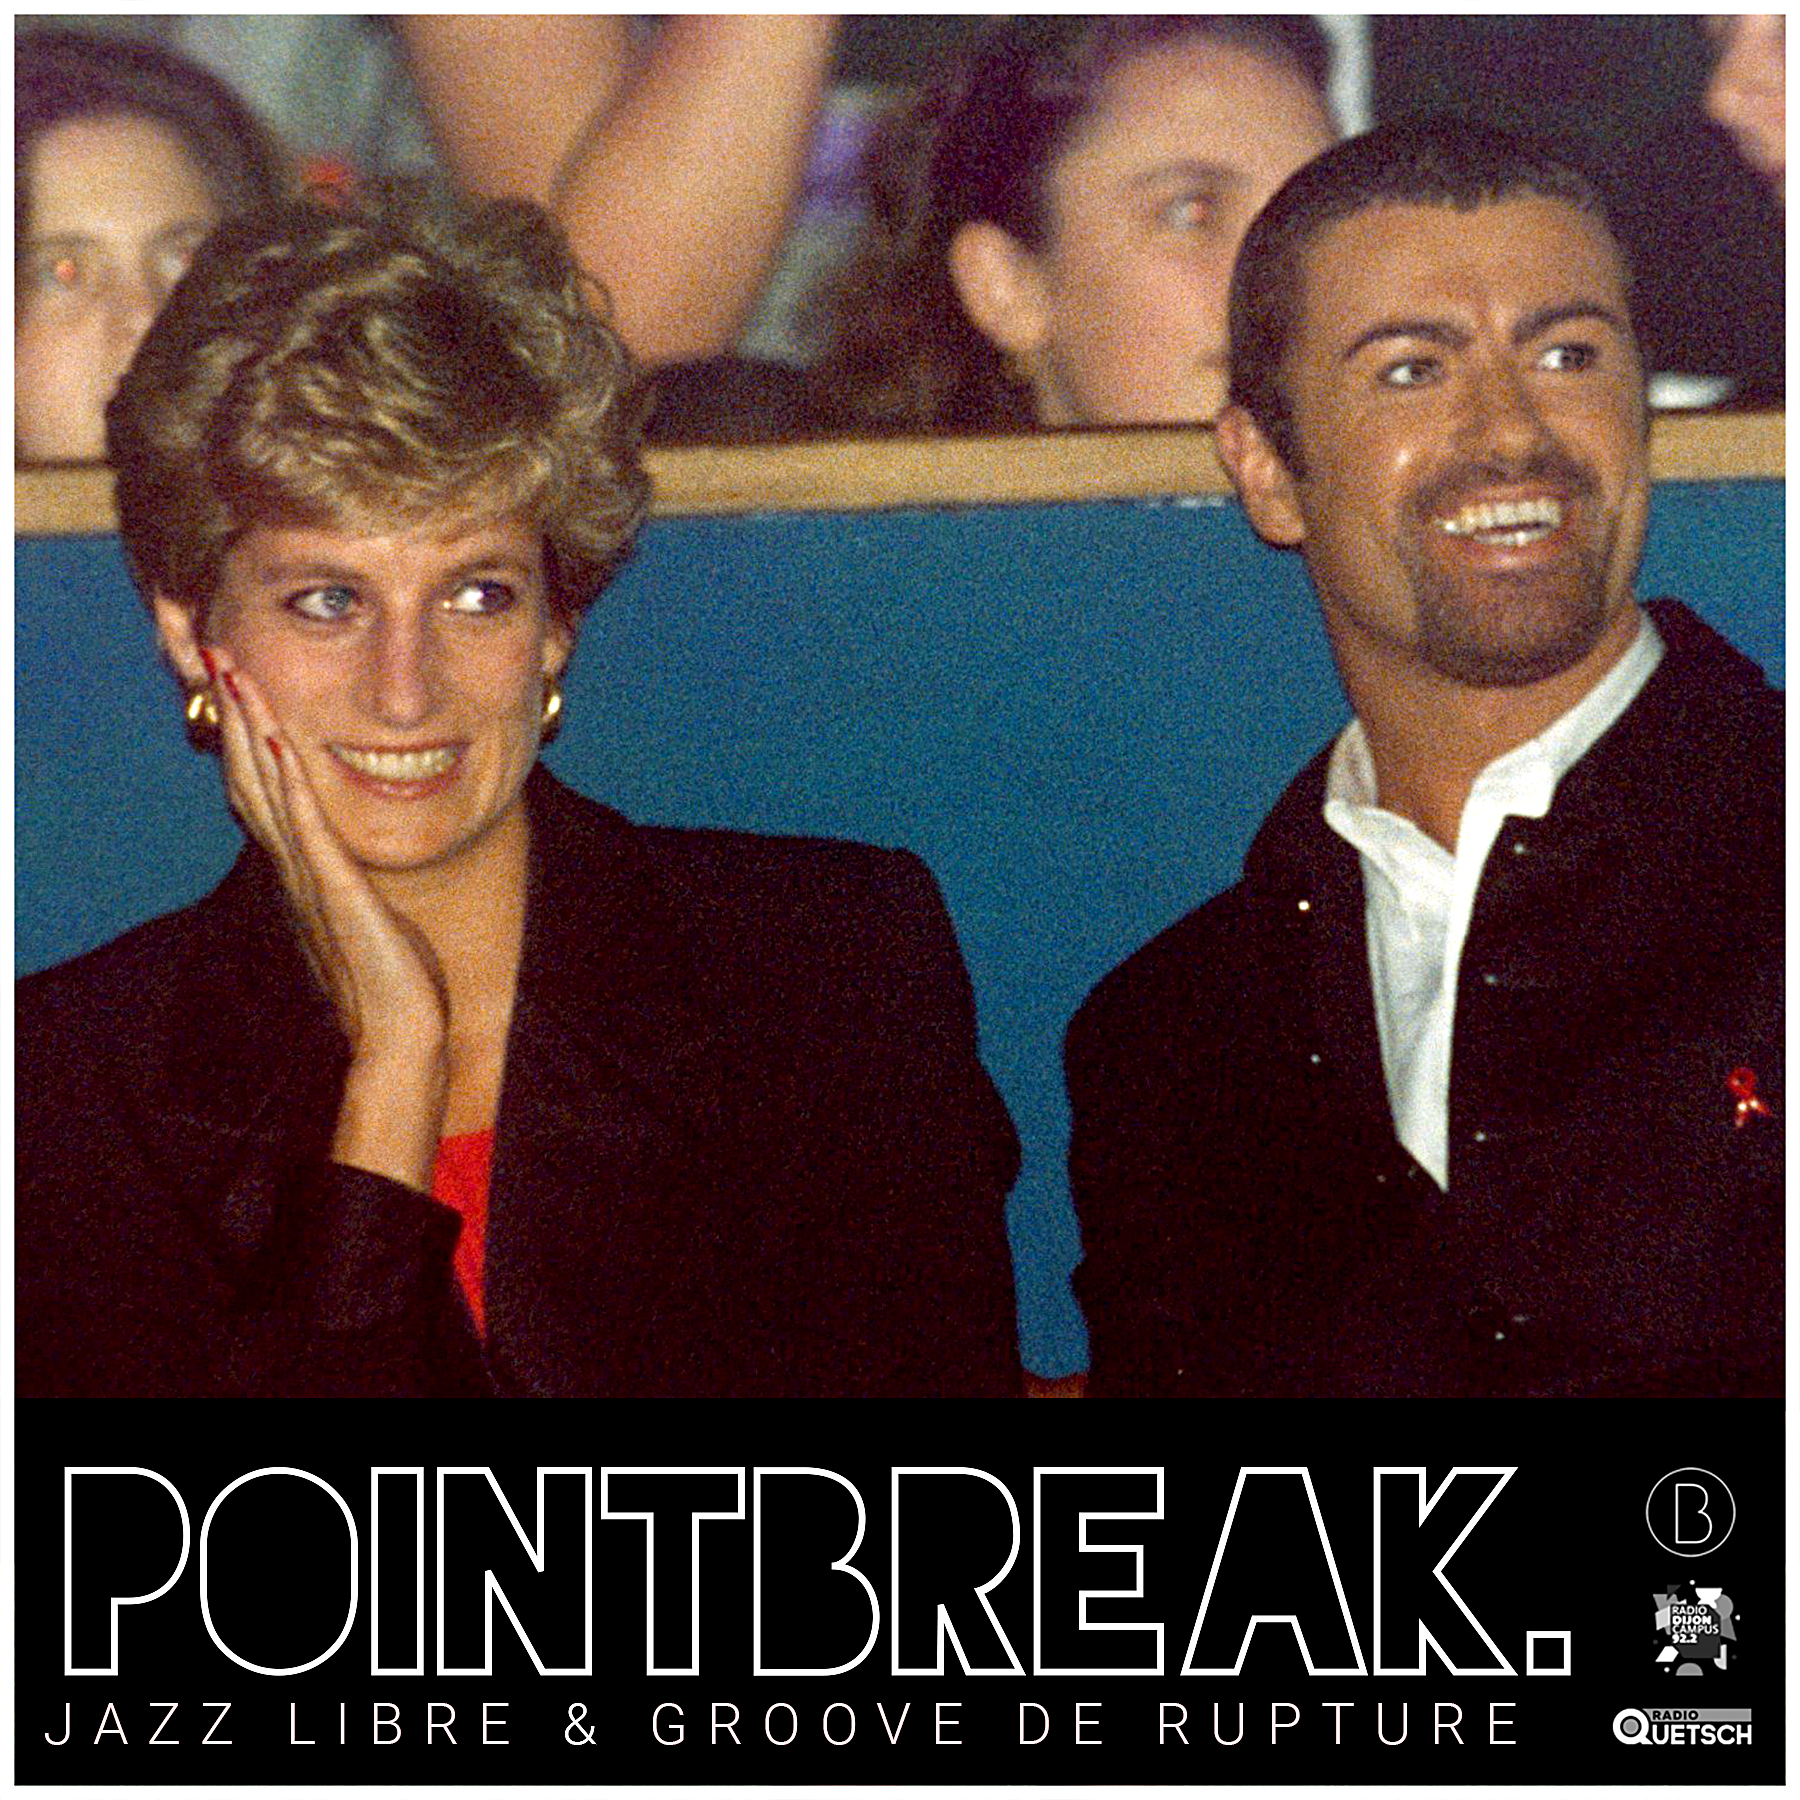 PointBreak, Radio Mix S03 E25